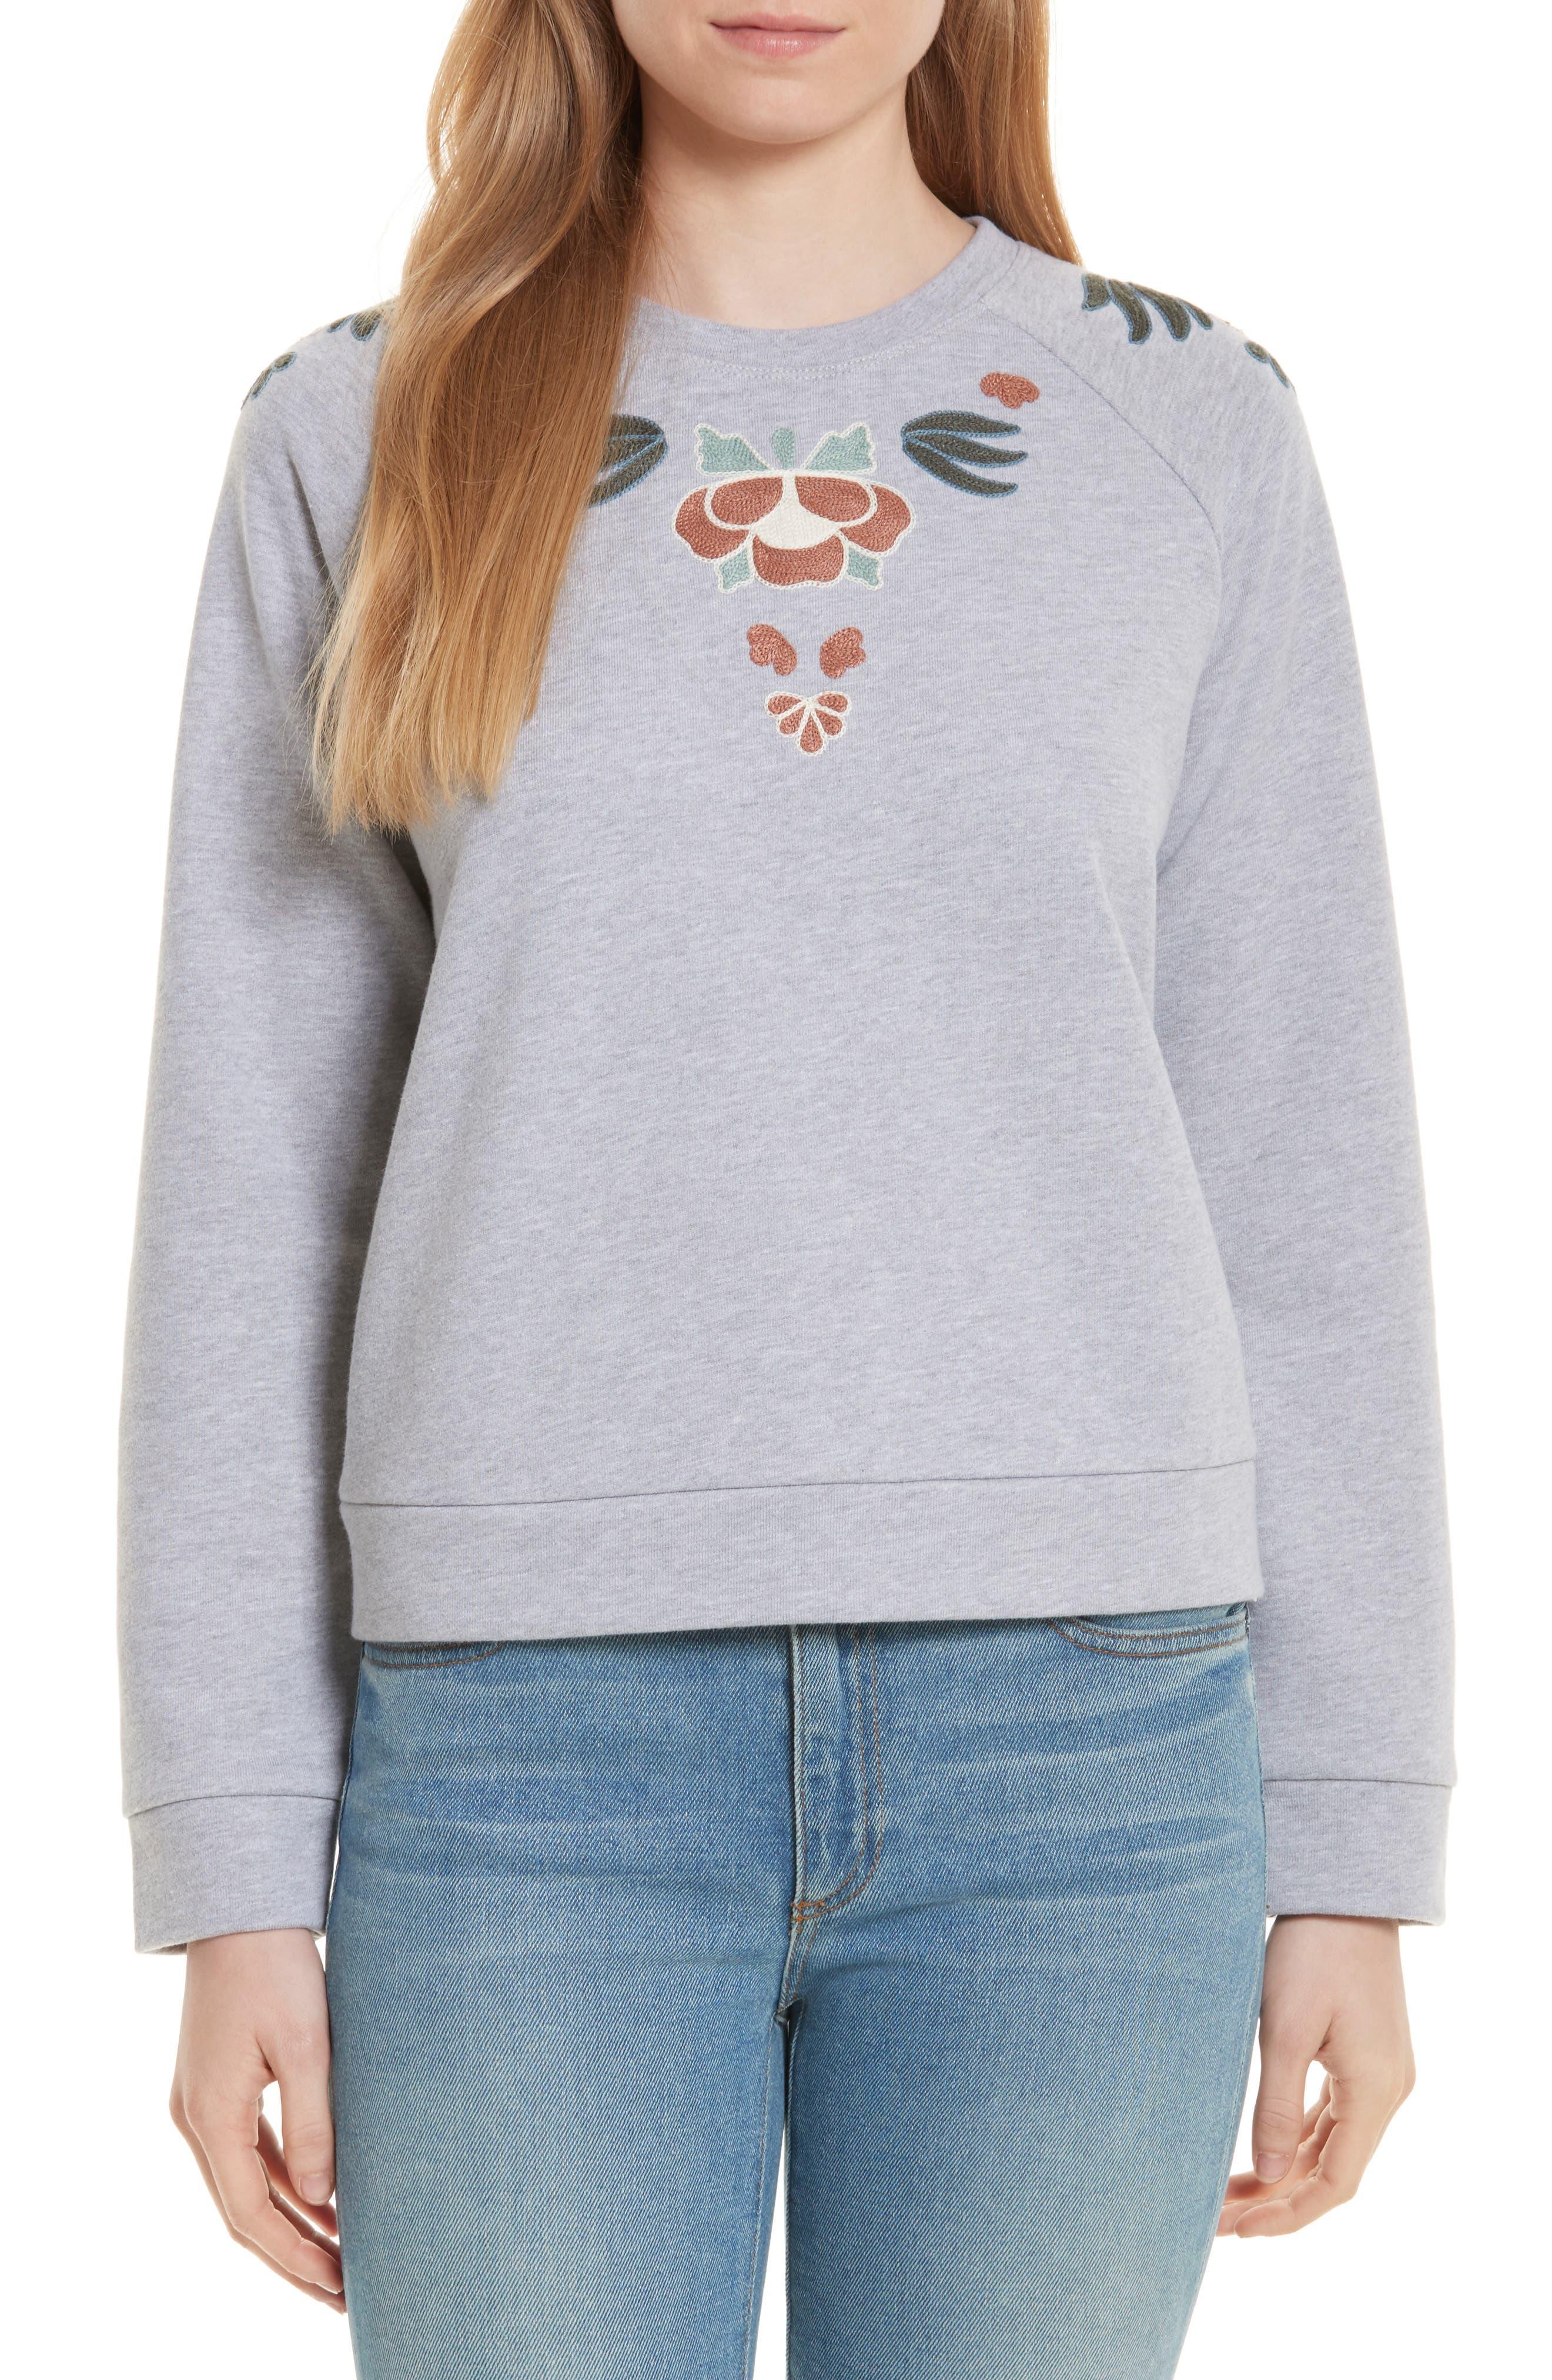 Jennings Embroidered Sweatshirt,                         Main,                         color, 021